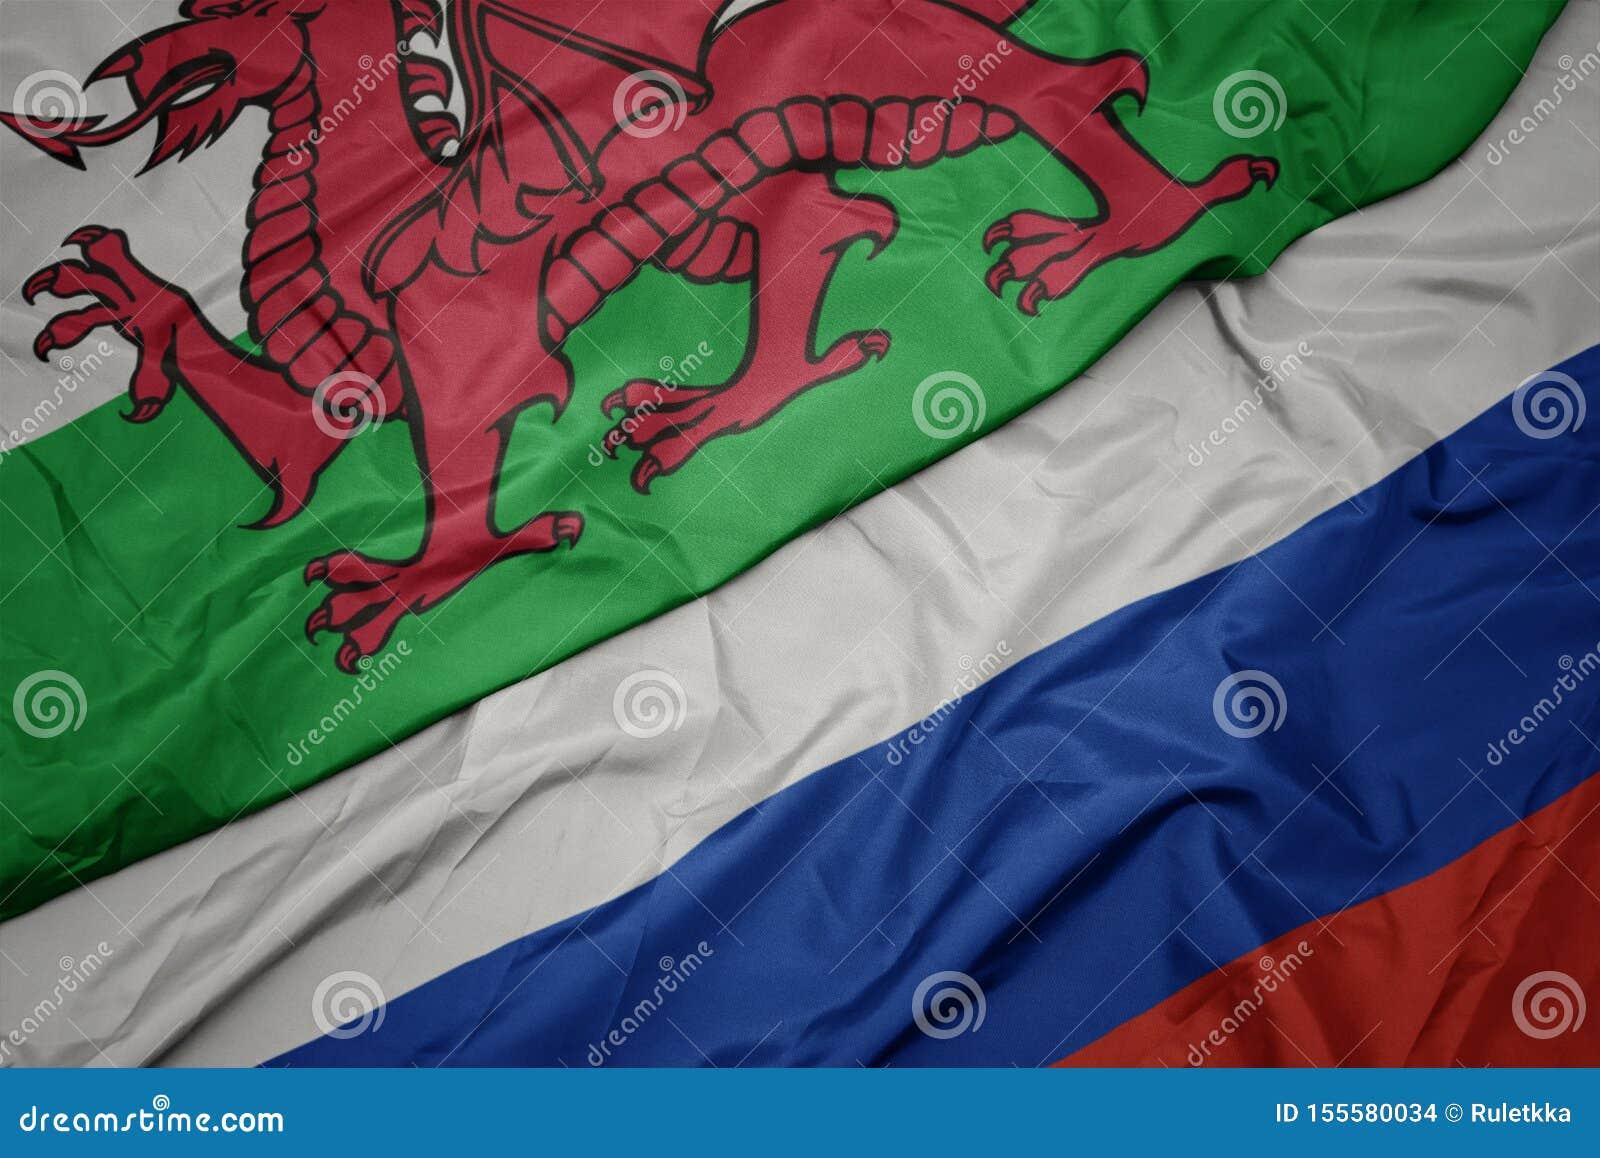 Bandiera variopinta d ondeggiamento della Russia e bandiera nazionale del Galles